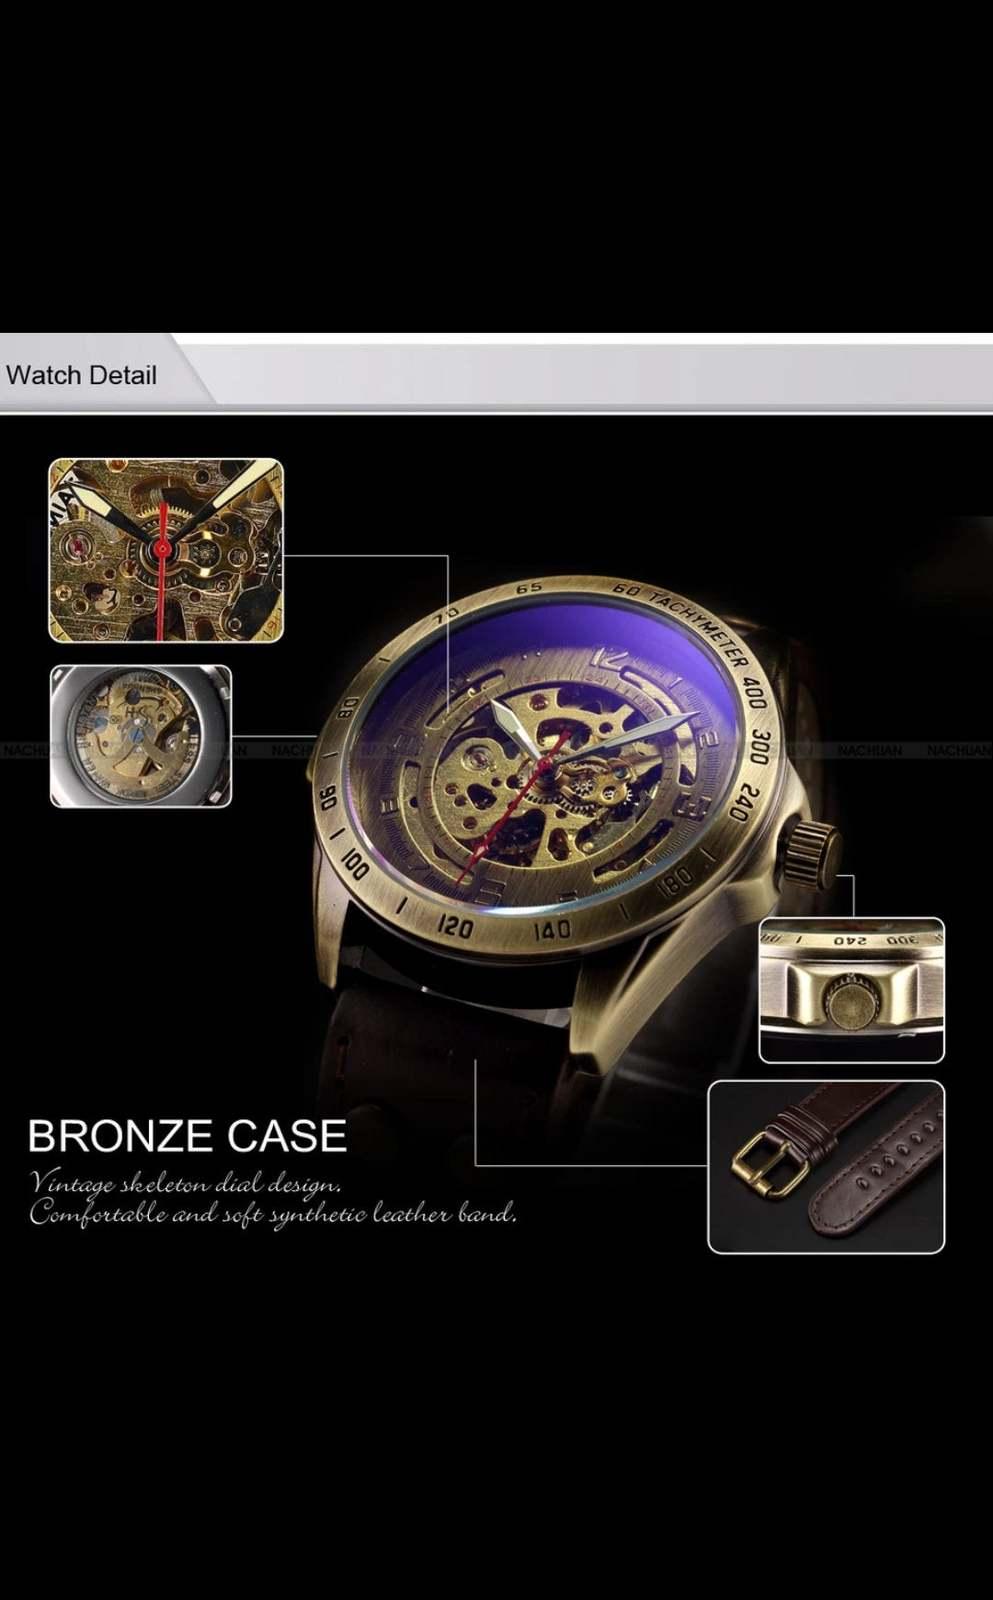 Luxury Vintage Retro Automatic Mechanical Watch- Automatics Self-Wind- Antique w image 6